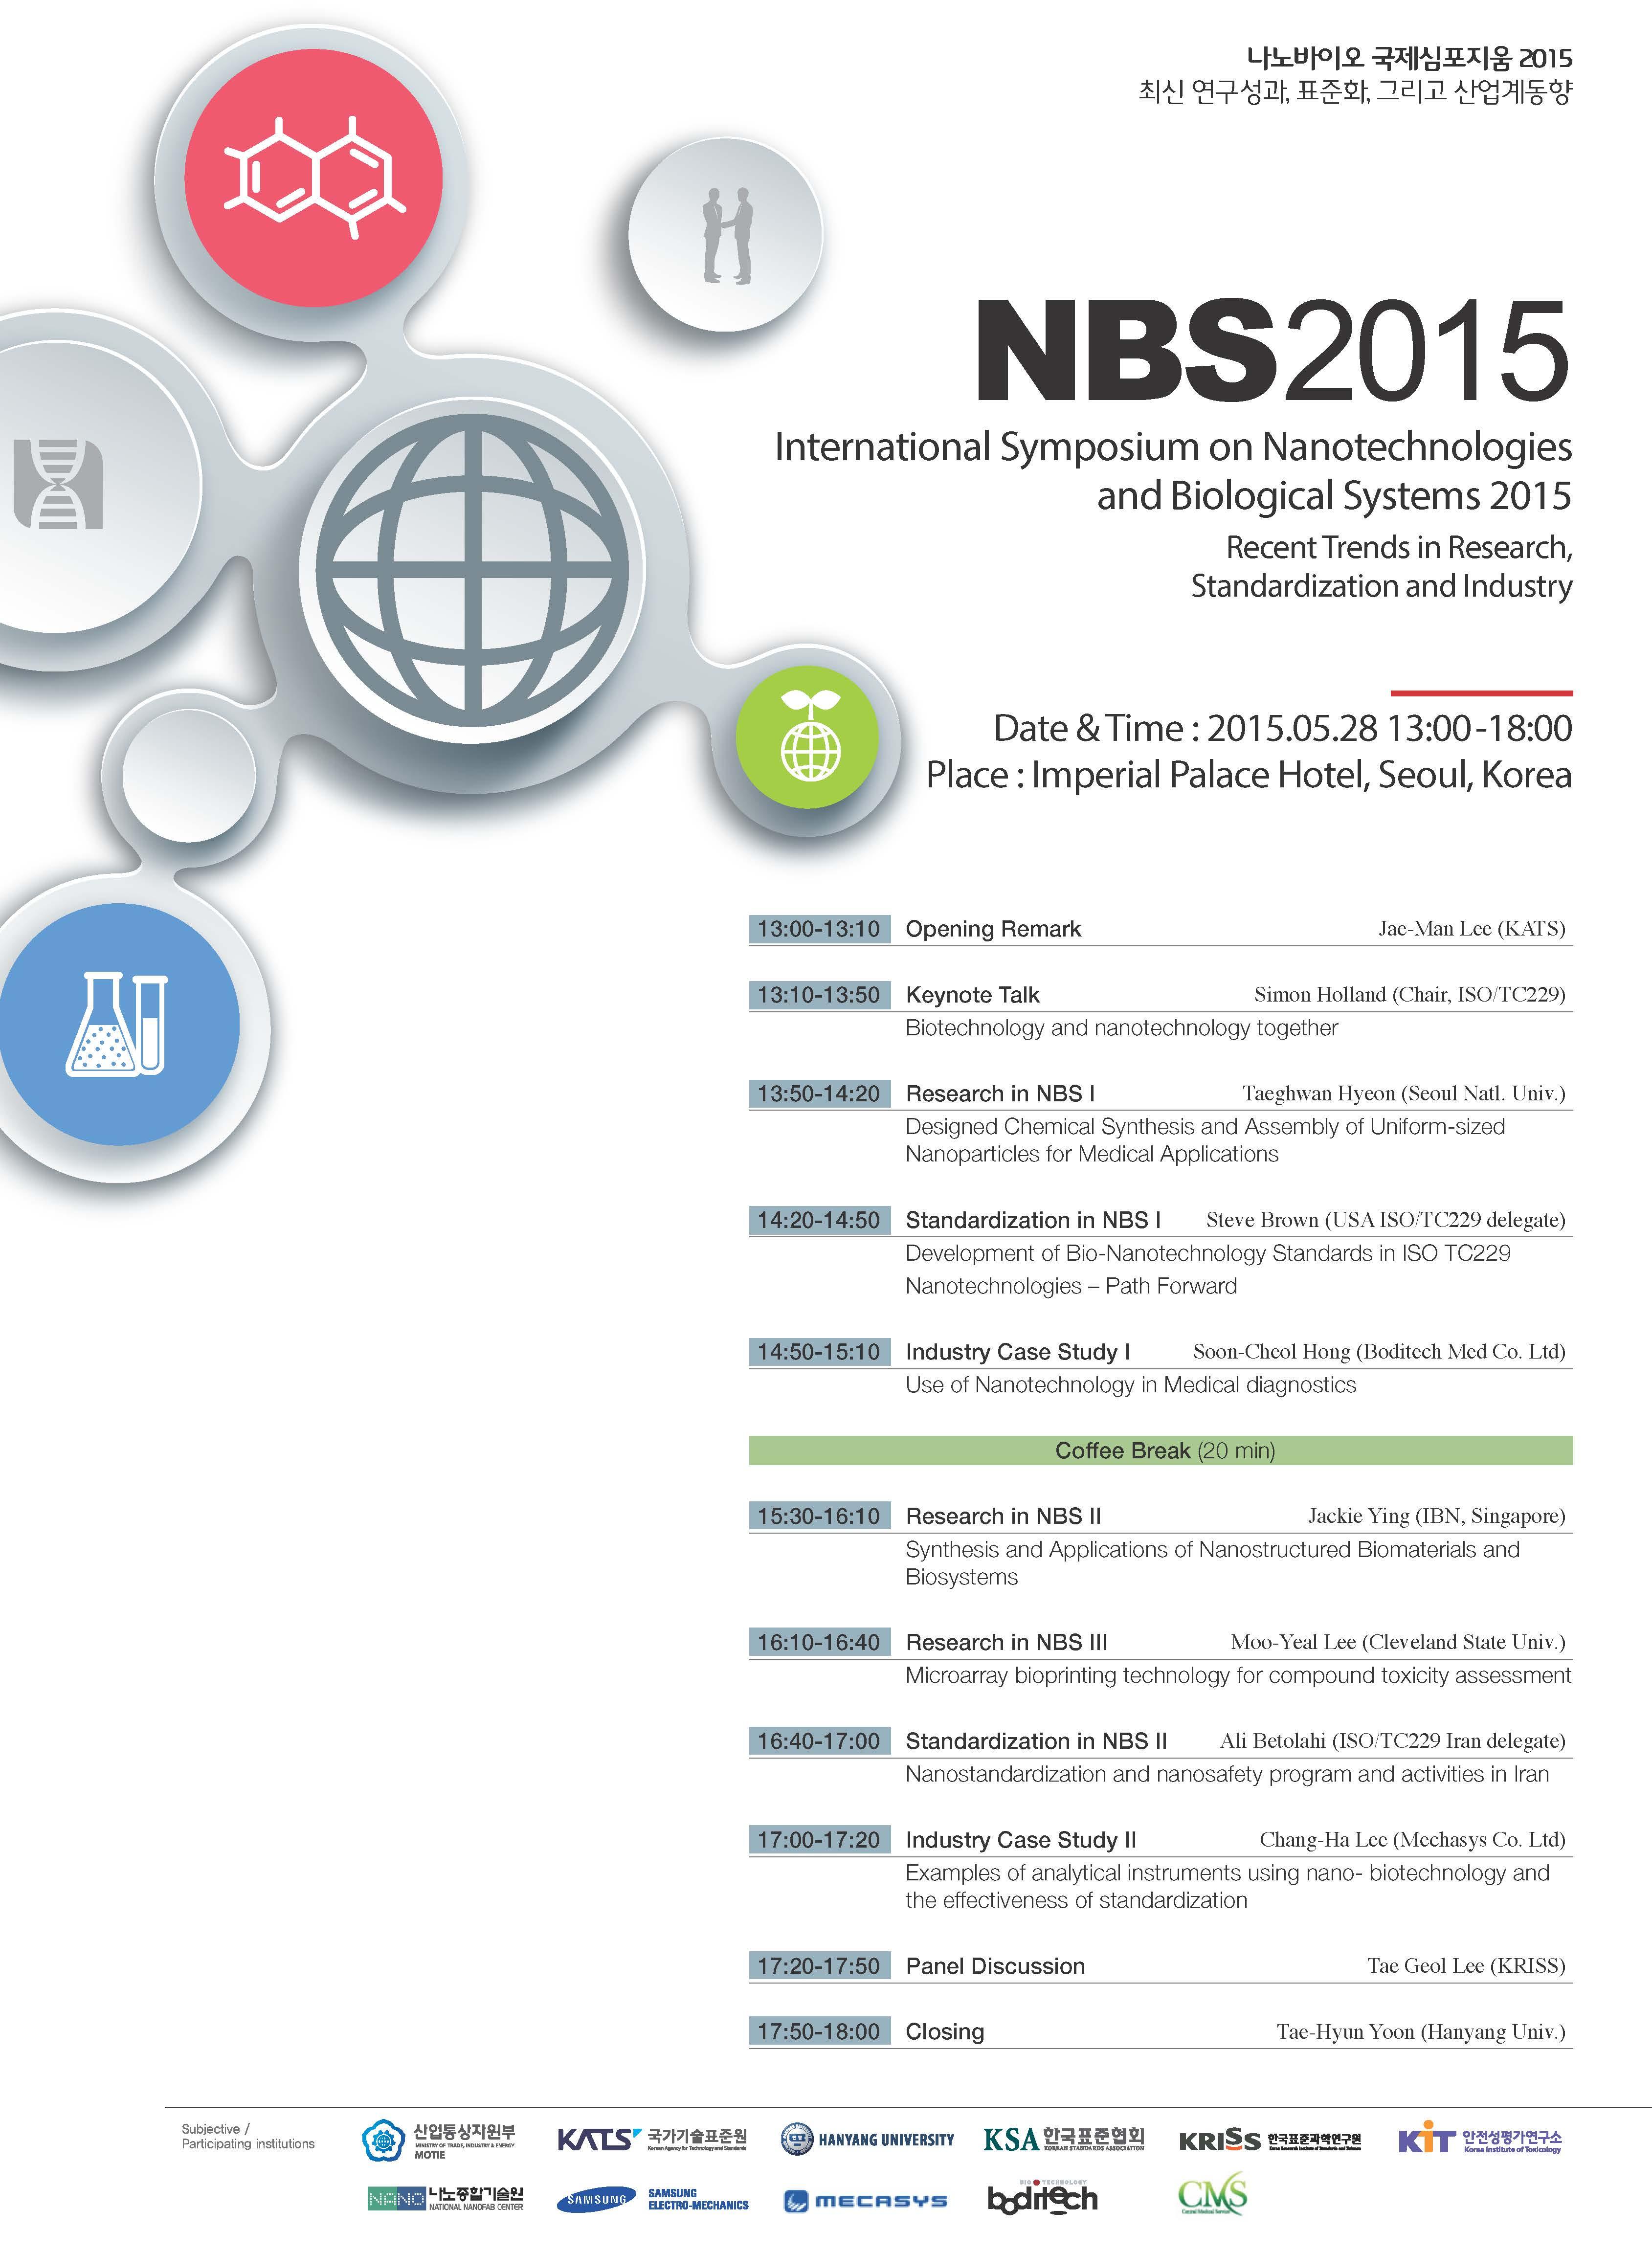 NBS2015 Symposium.jpg